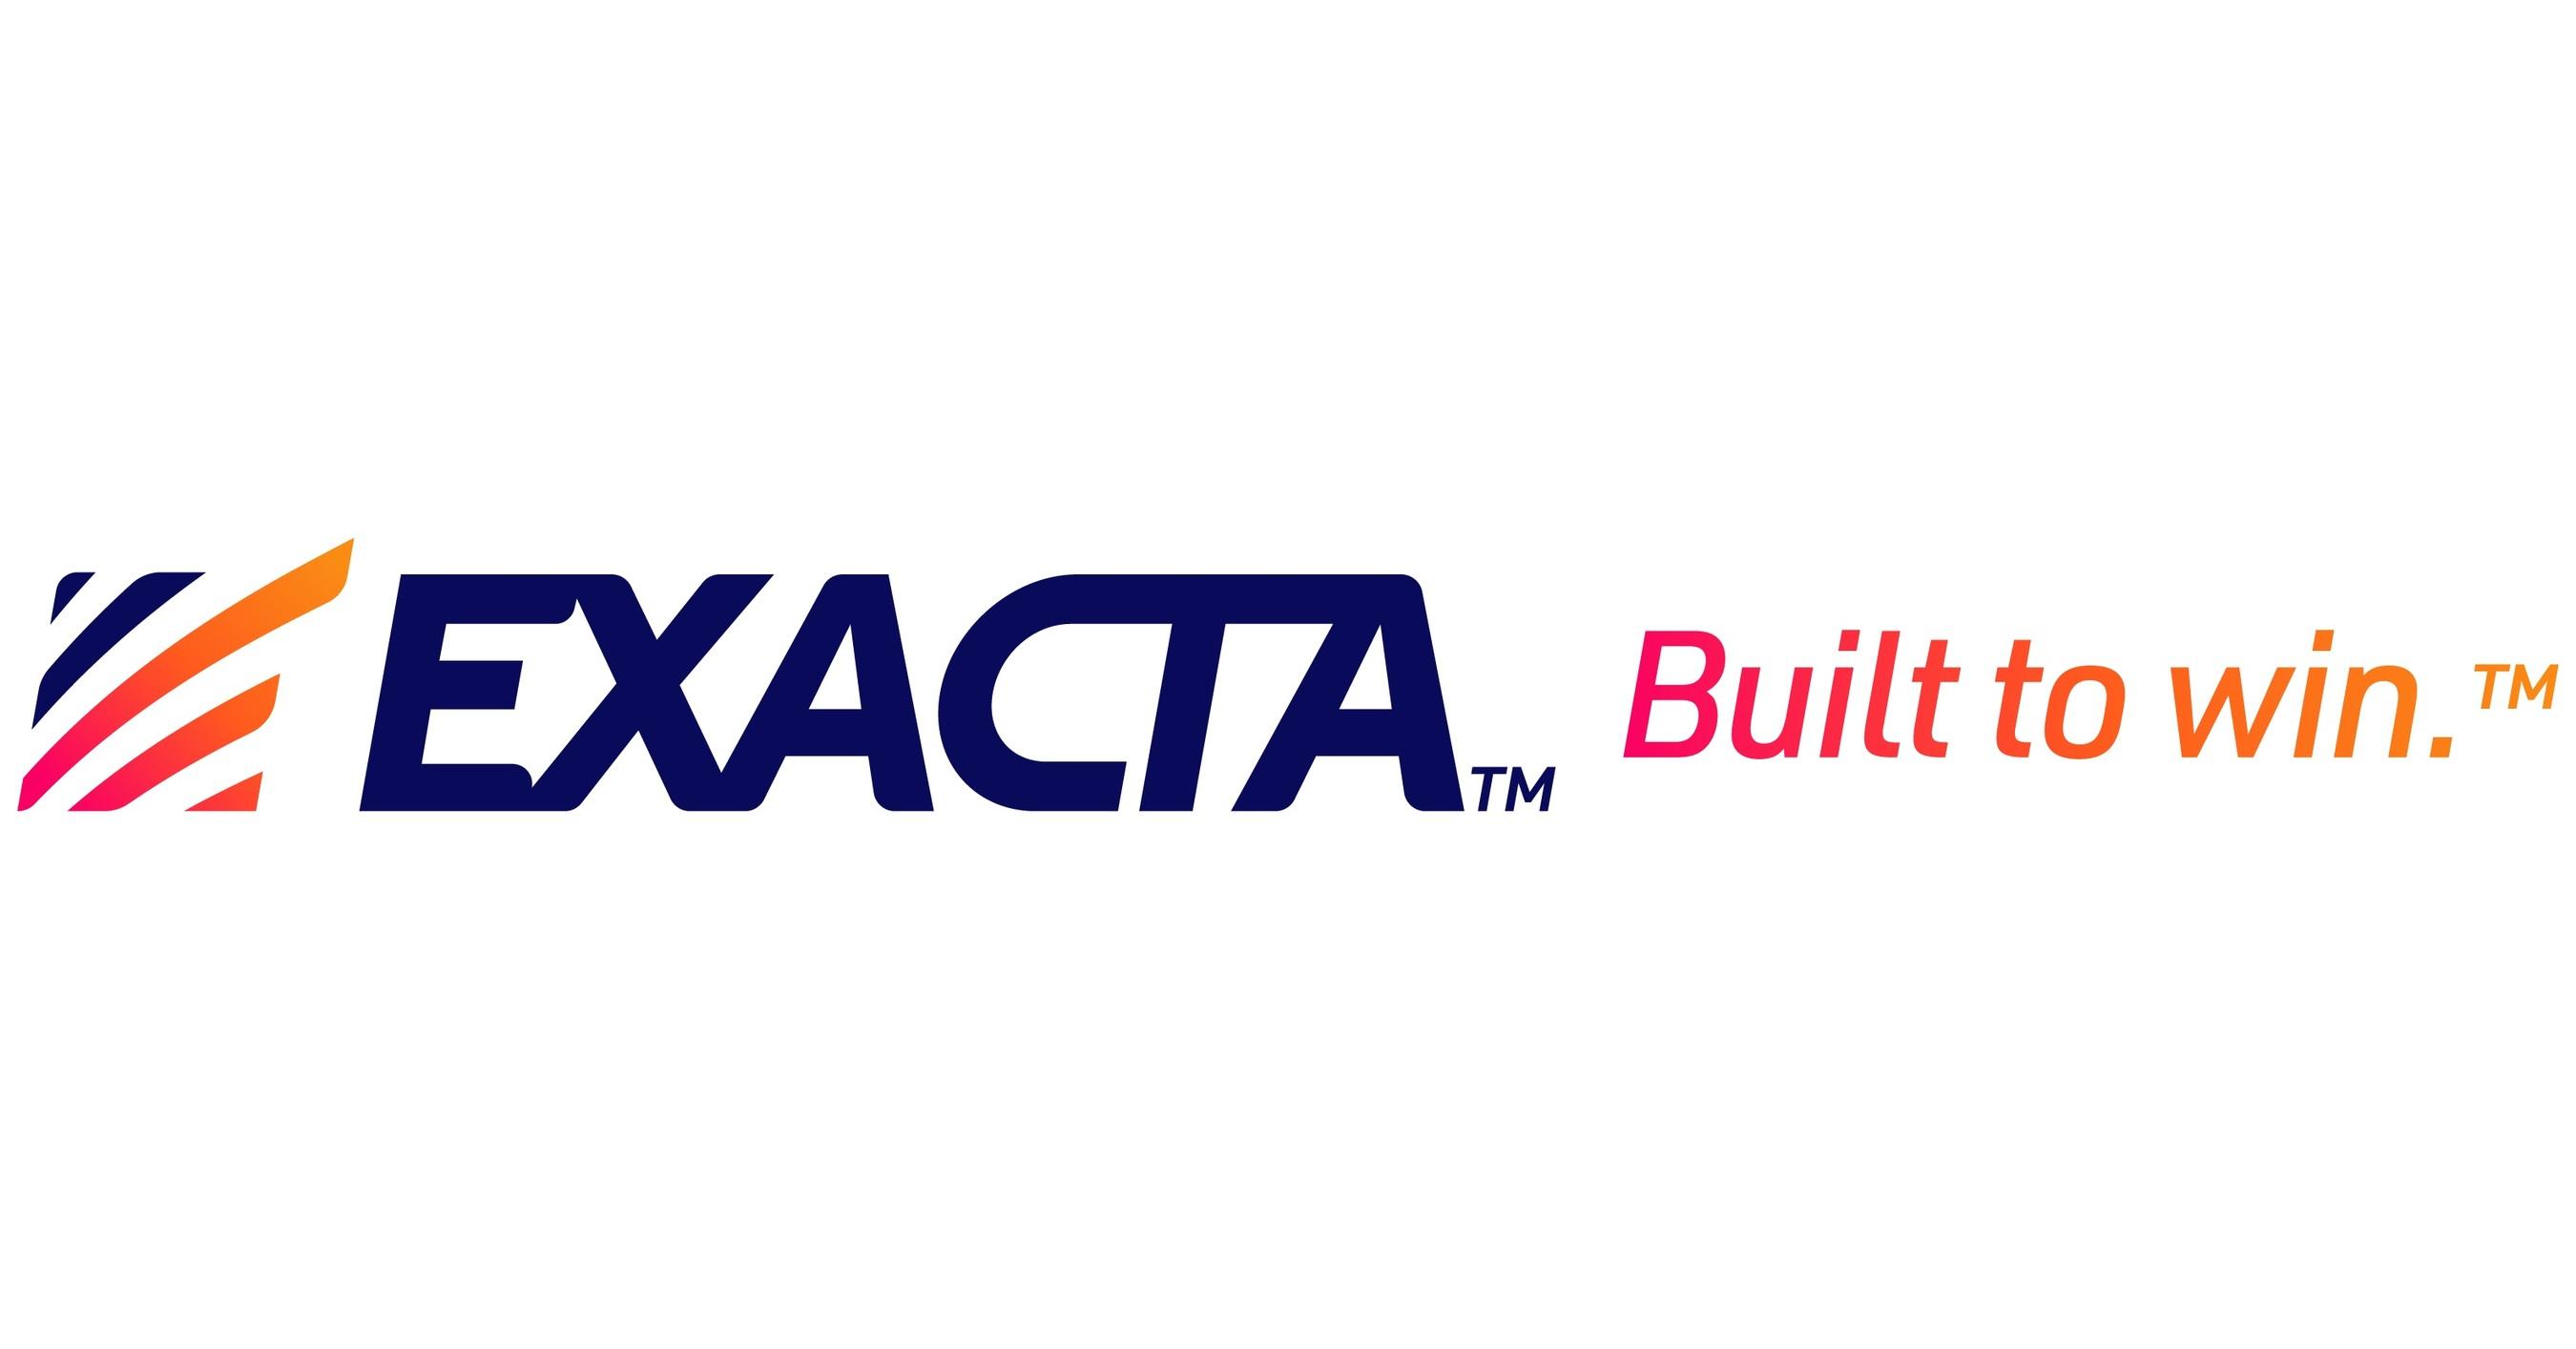 Exacta Methods indicators historic horse racing settlement with Konami Gaming, Inc.